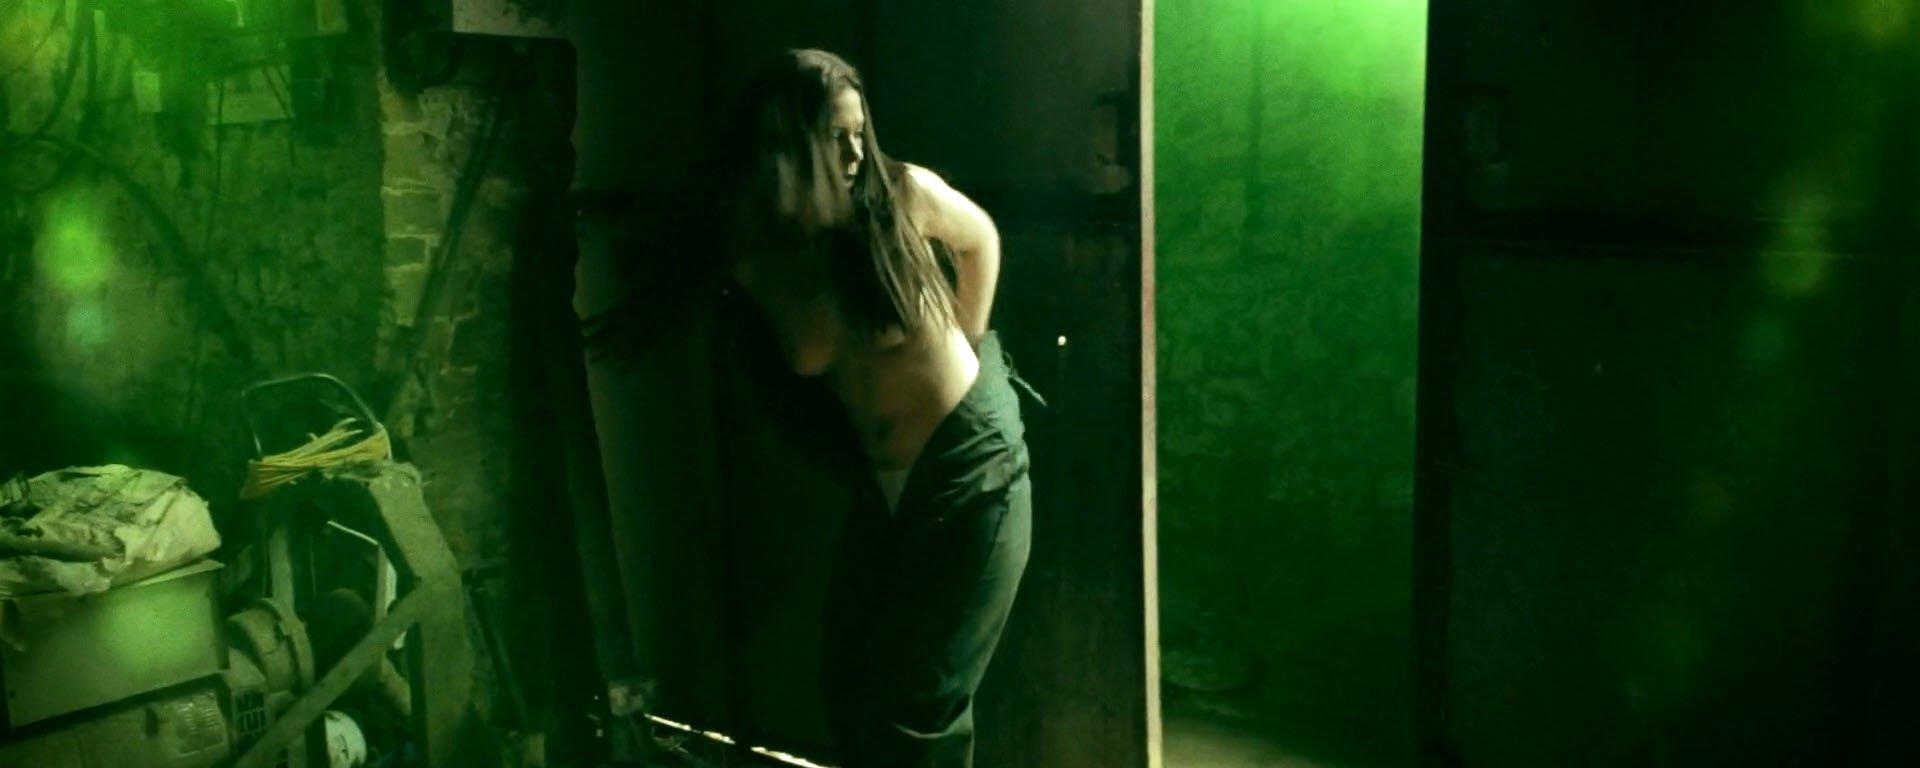 Camilla Rowland nude, Angela Holmes nude - Cute Little Buggers (2017)